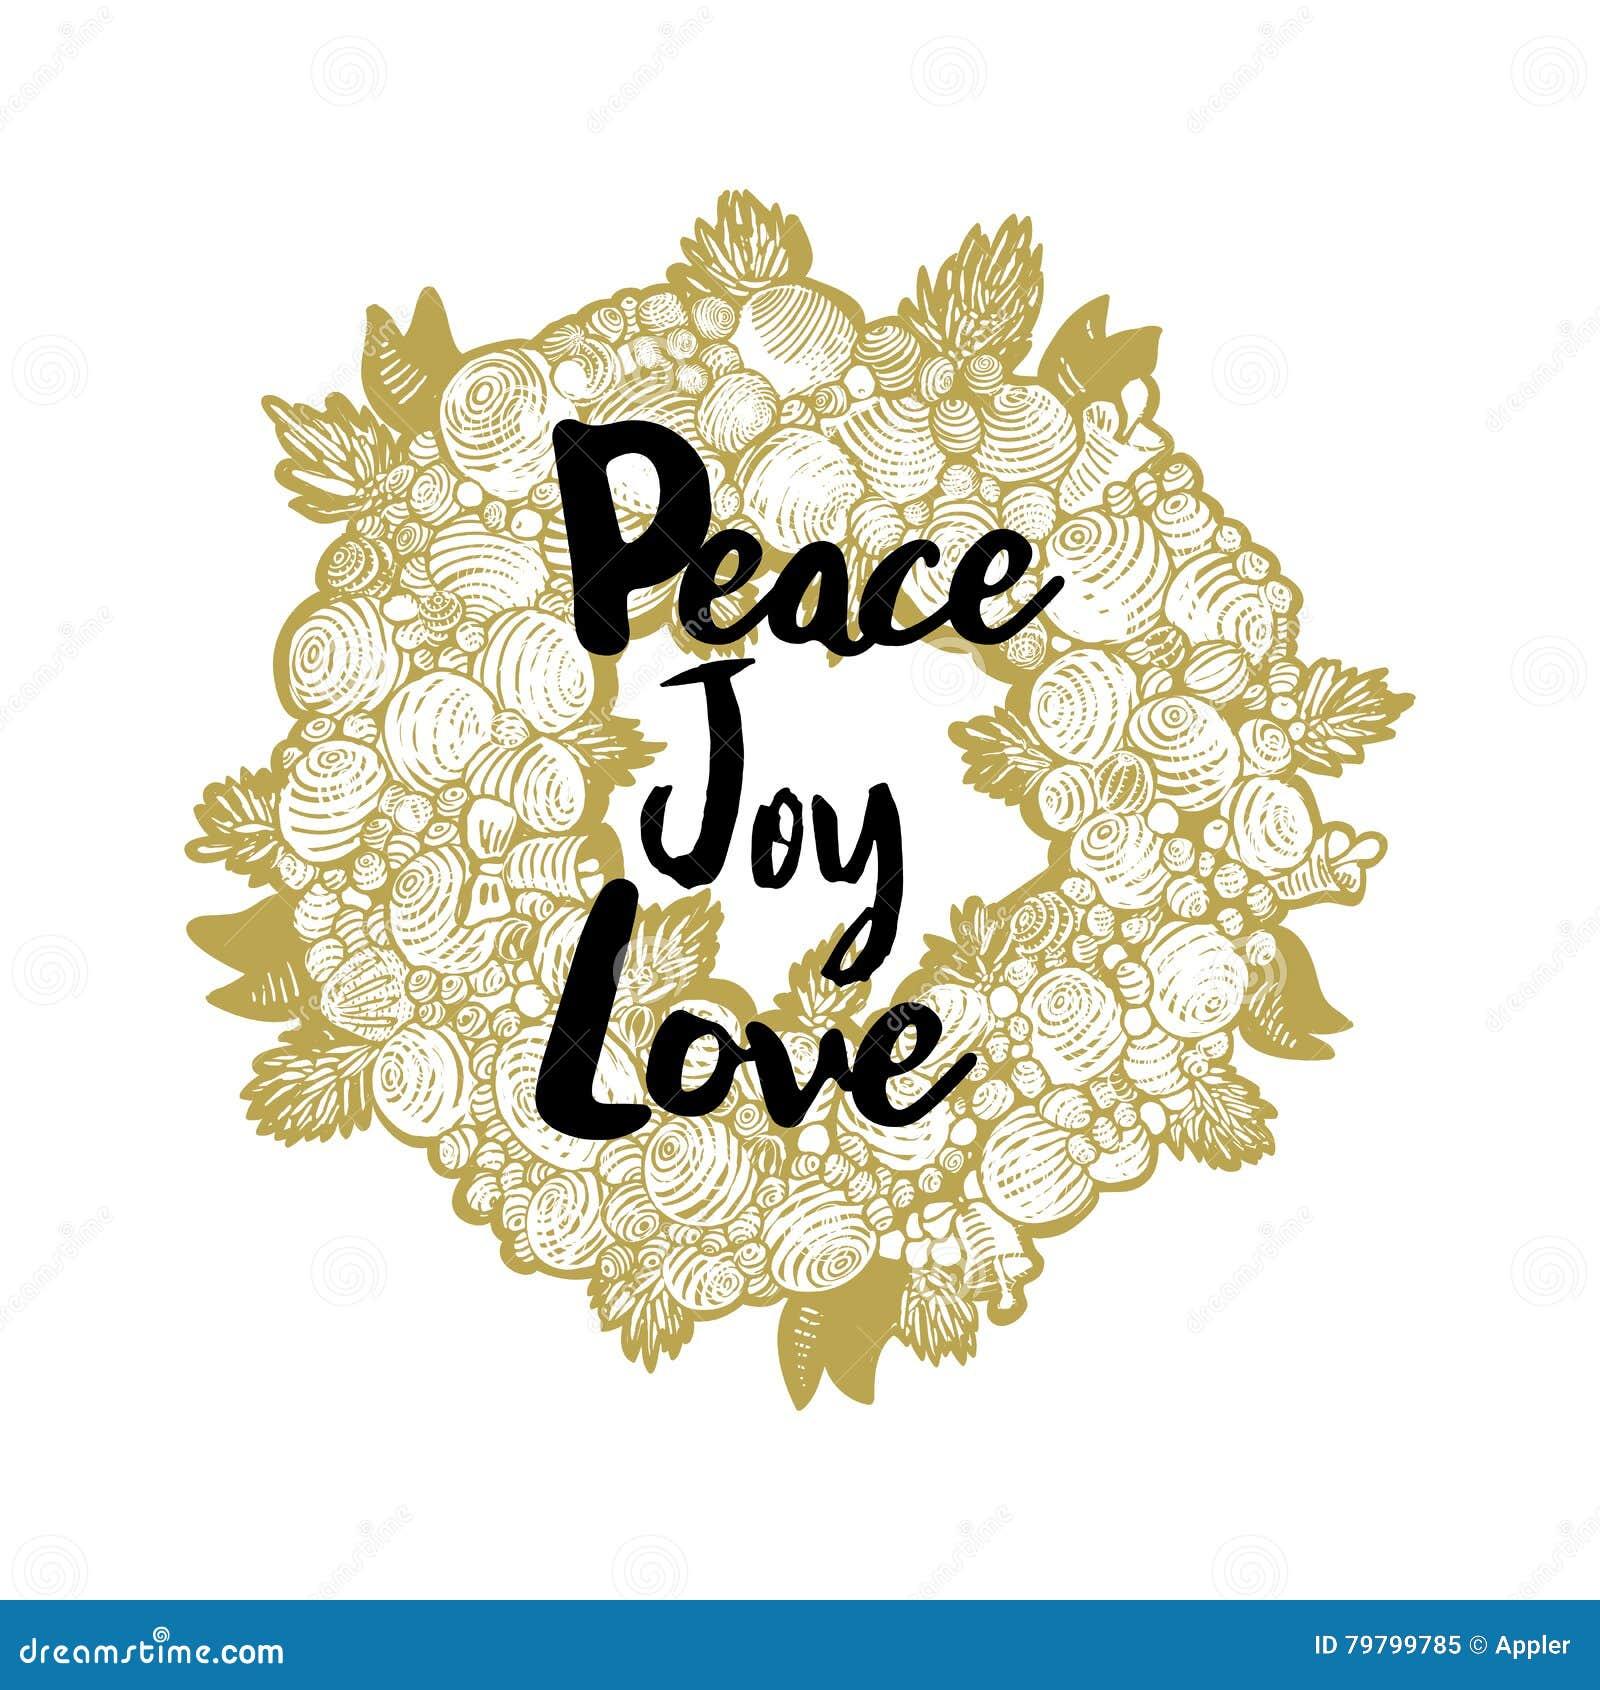 Xmas Golden Wreath And Peace Love Joy Stock Vector - Illustration of ...